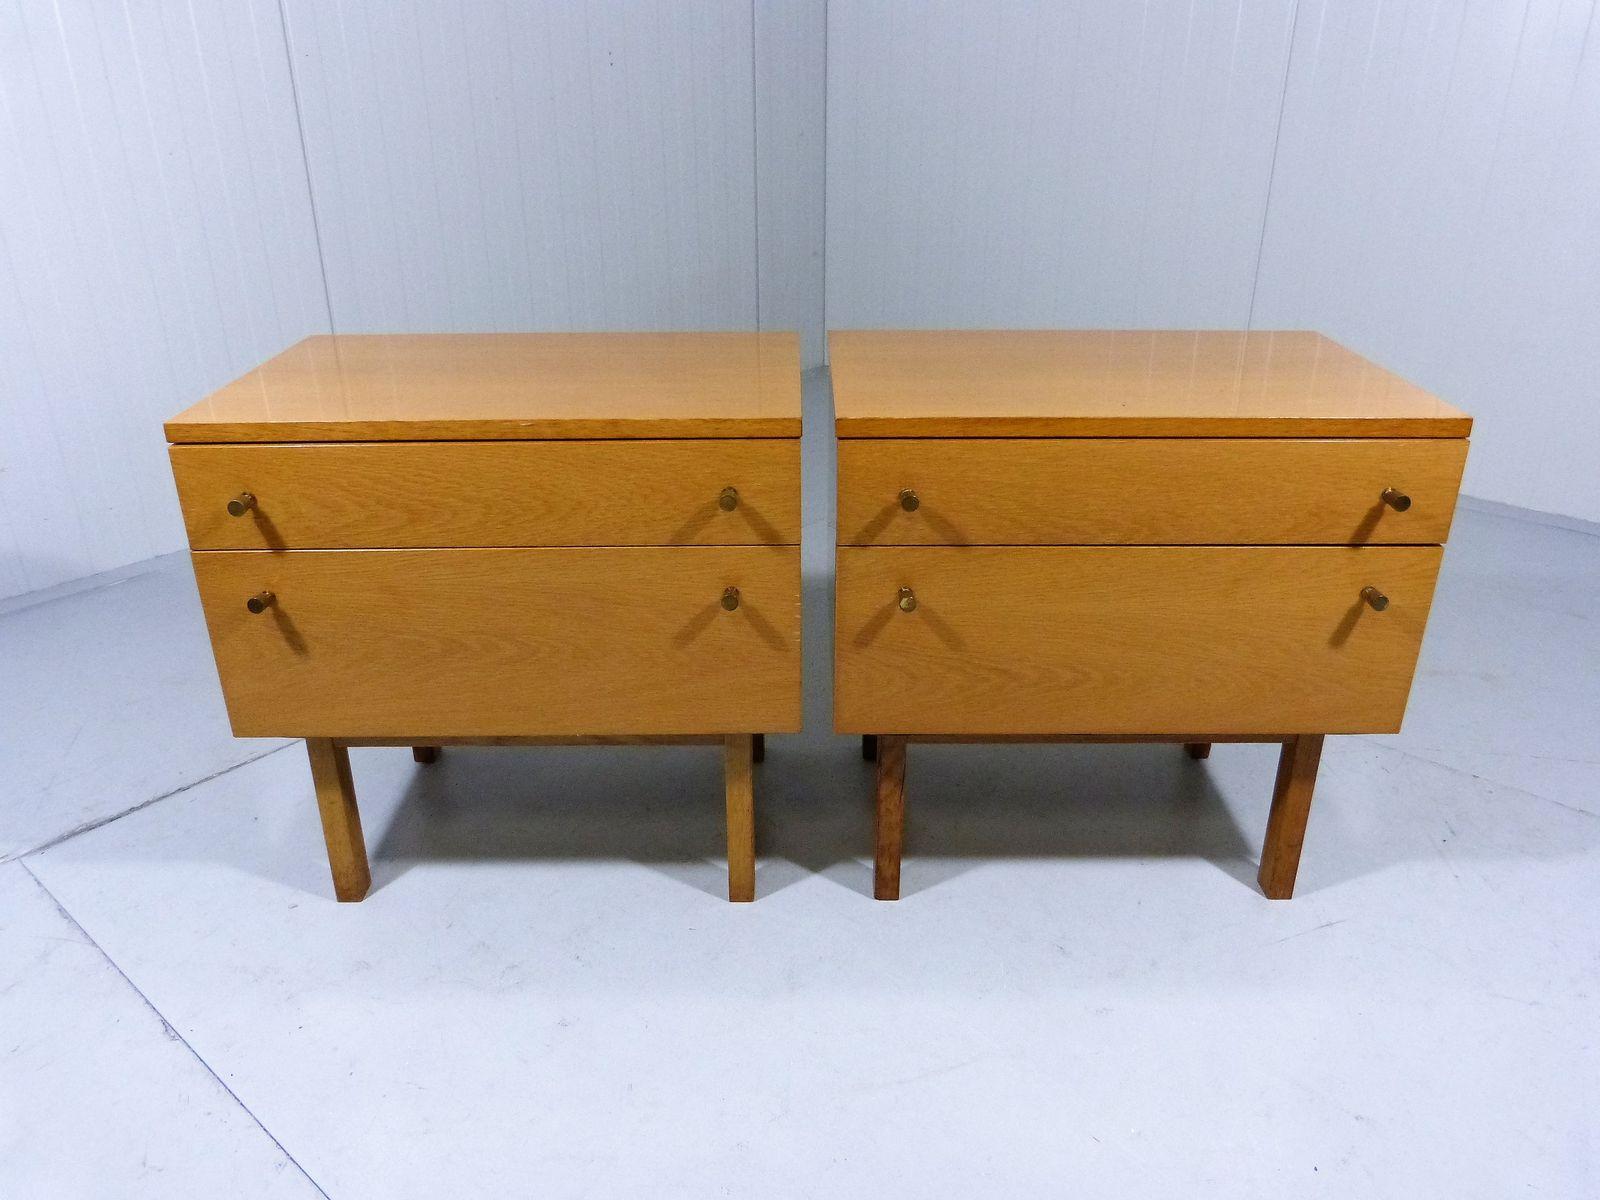 Vintage Nightstands Part - 28: Vintage Nightstands, 1950s, Set Of 2 For Sale At Pamono